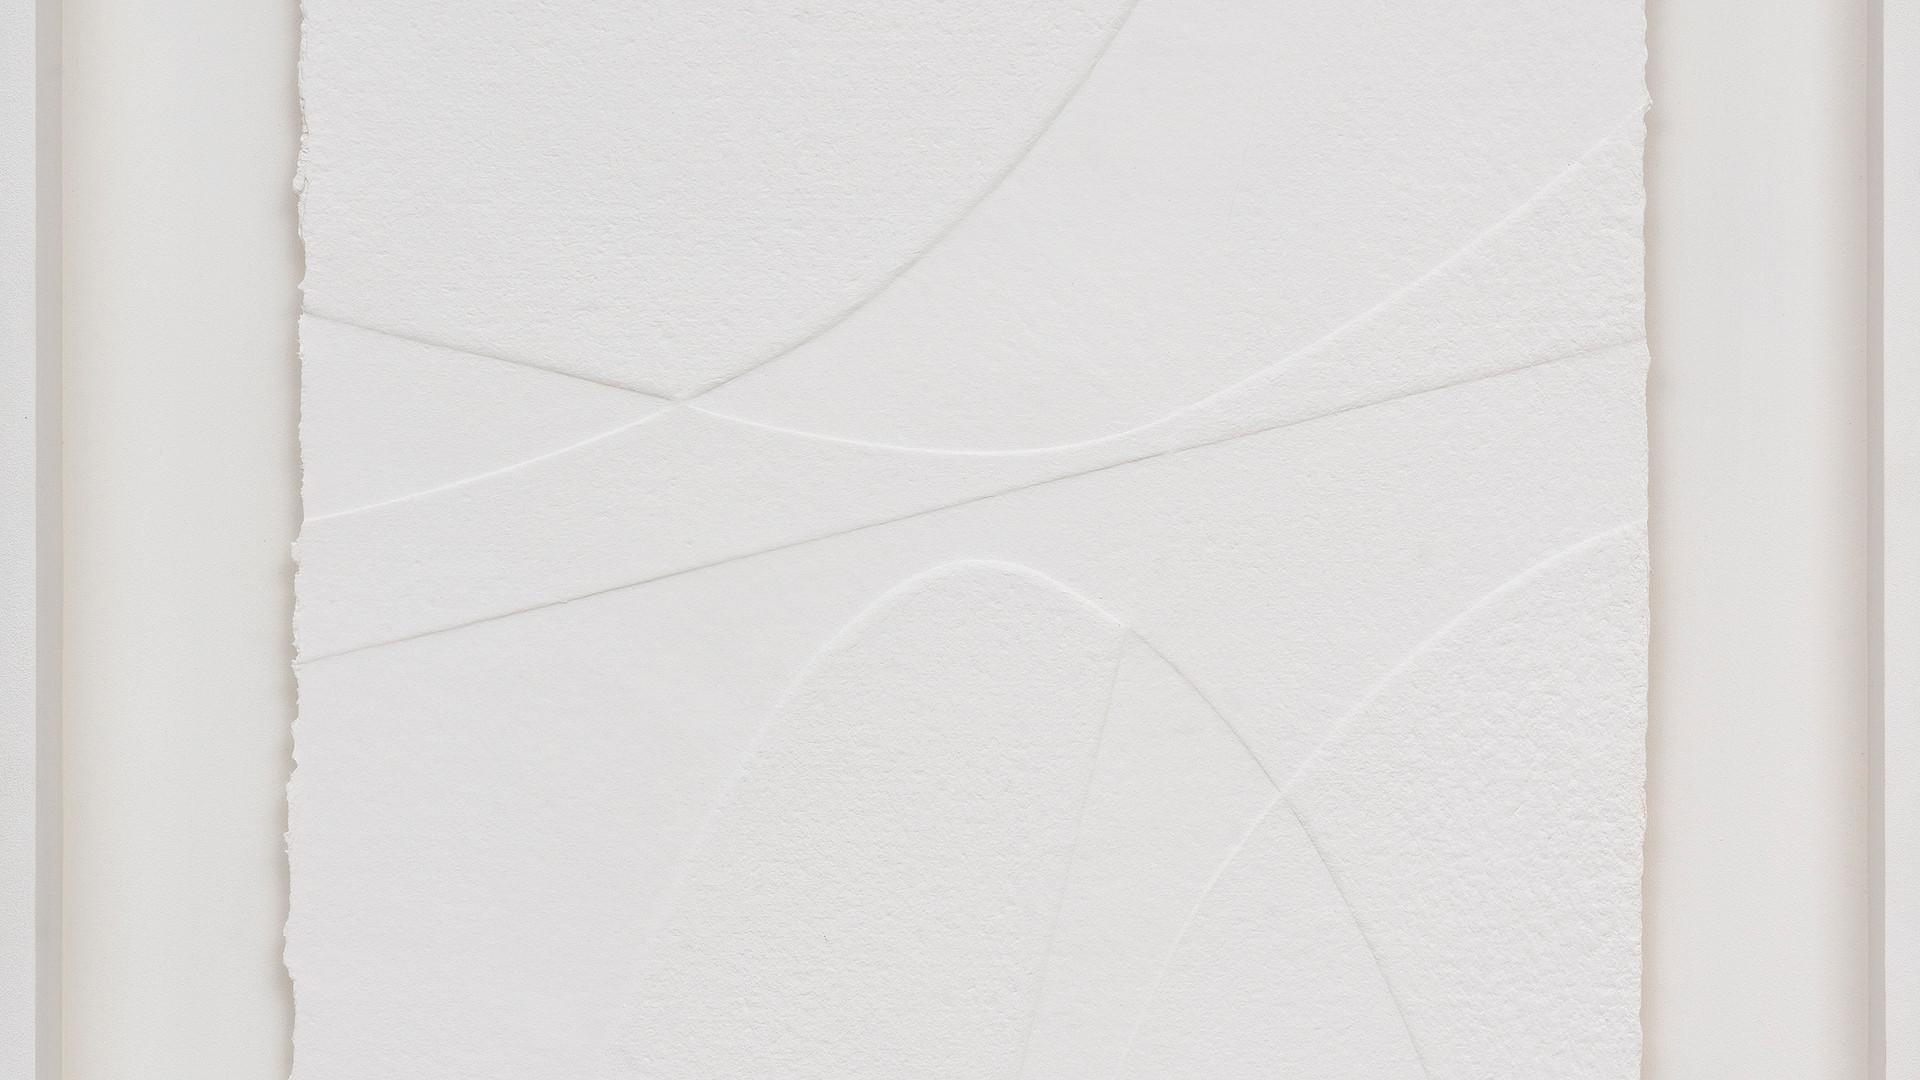 René Galassi Lignes géometriques - Esala 2019 Prägedruck auf handgeschöpftem Papier 20 Ex. 87 x 72 cm - verkauft